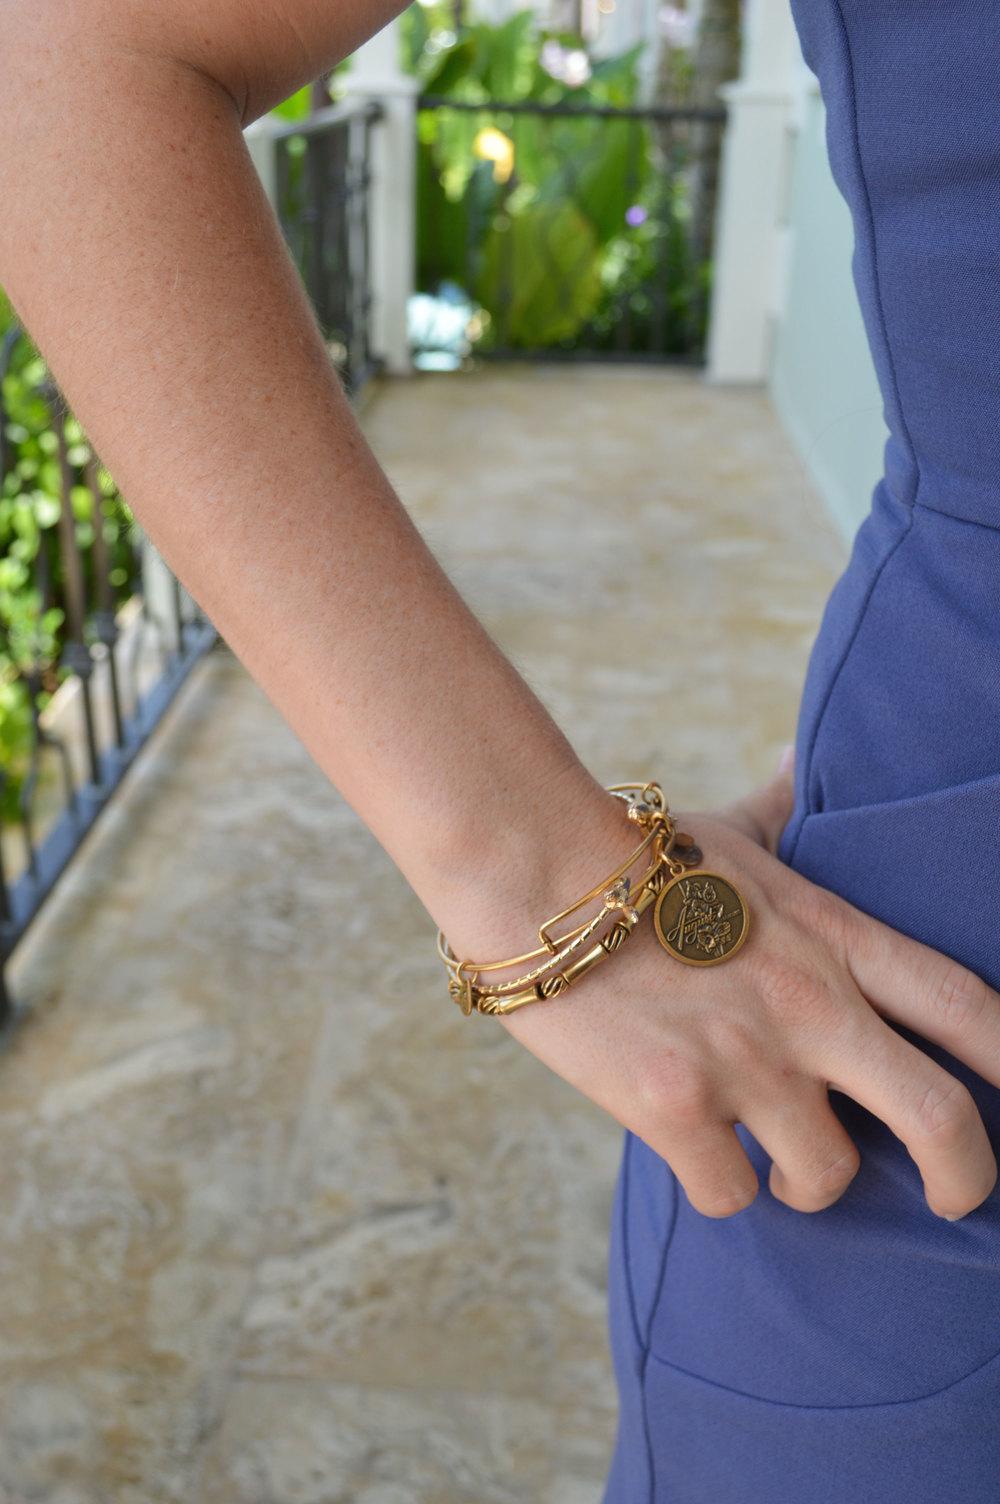 alex-ani-hm-dusty-blue-work-dress-aldo-shoes-wiw-church-nassau-blogger-style.jpeg